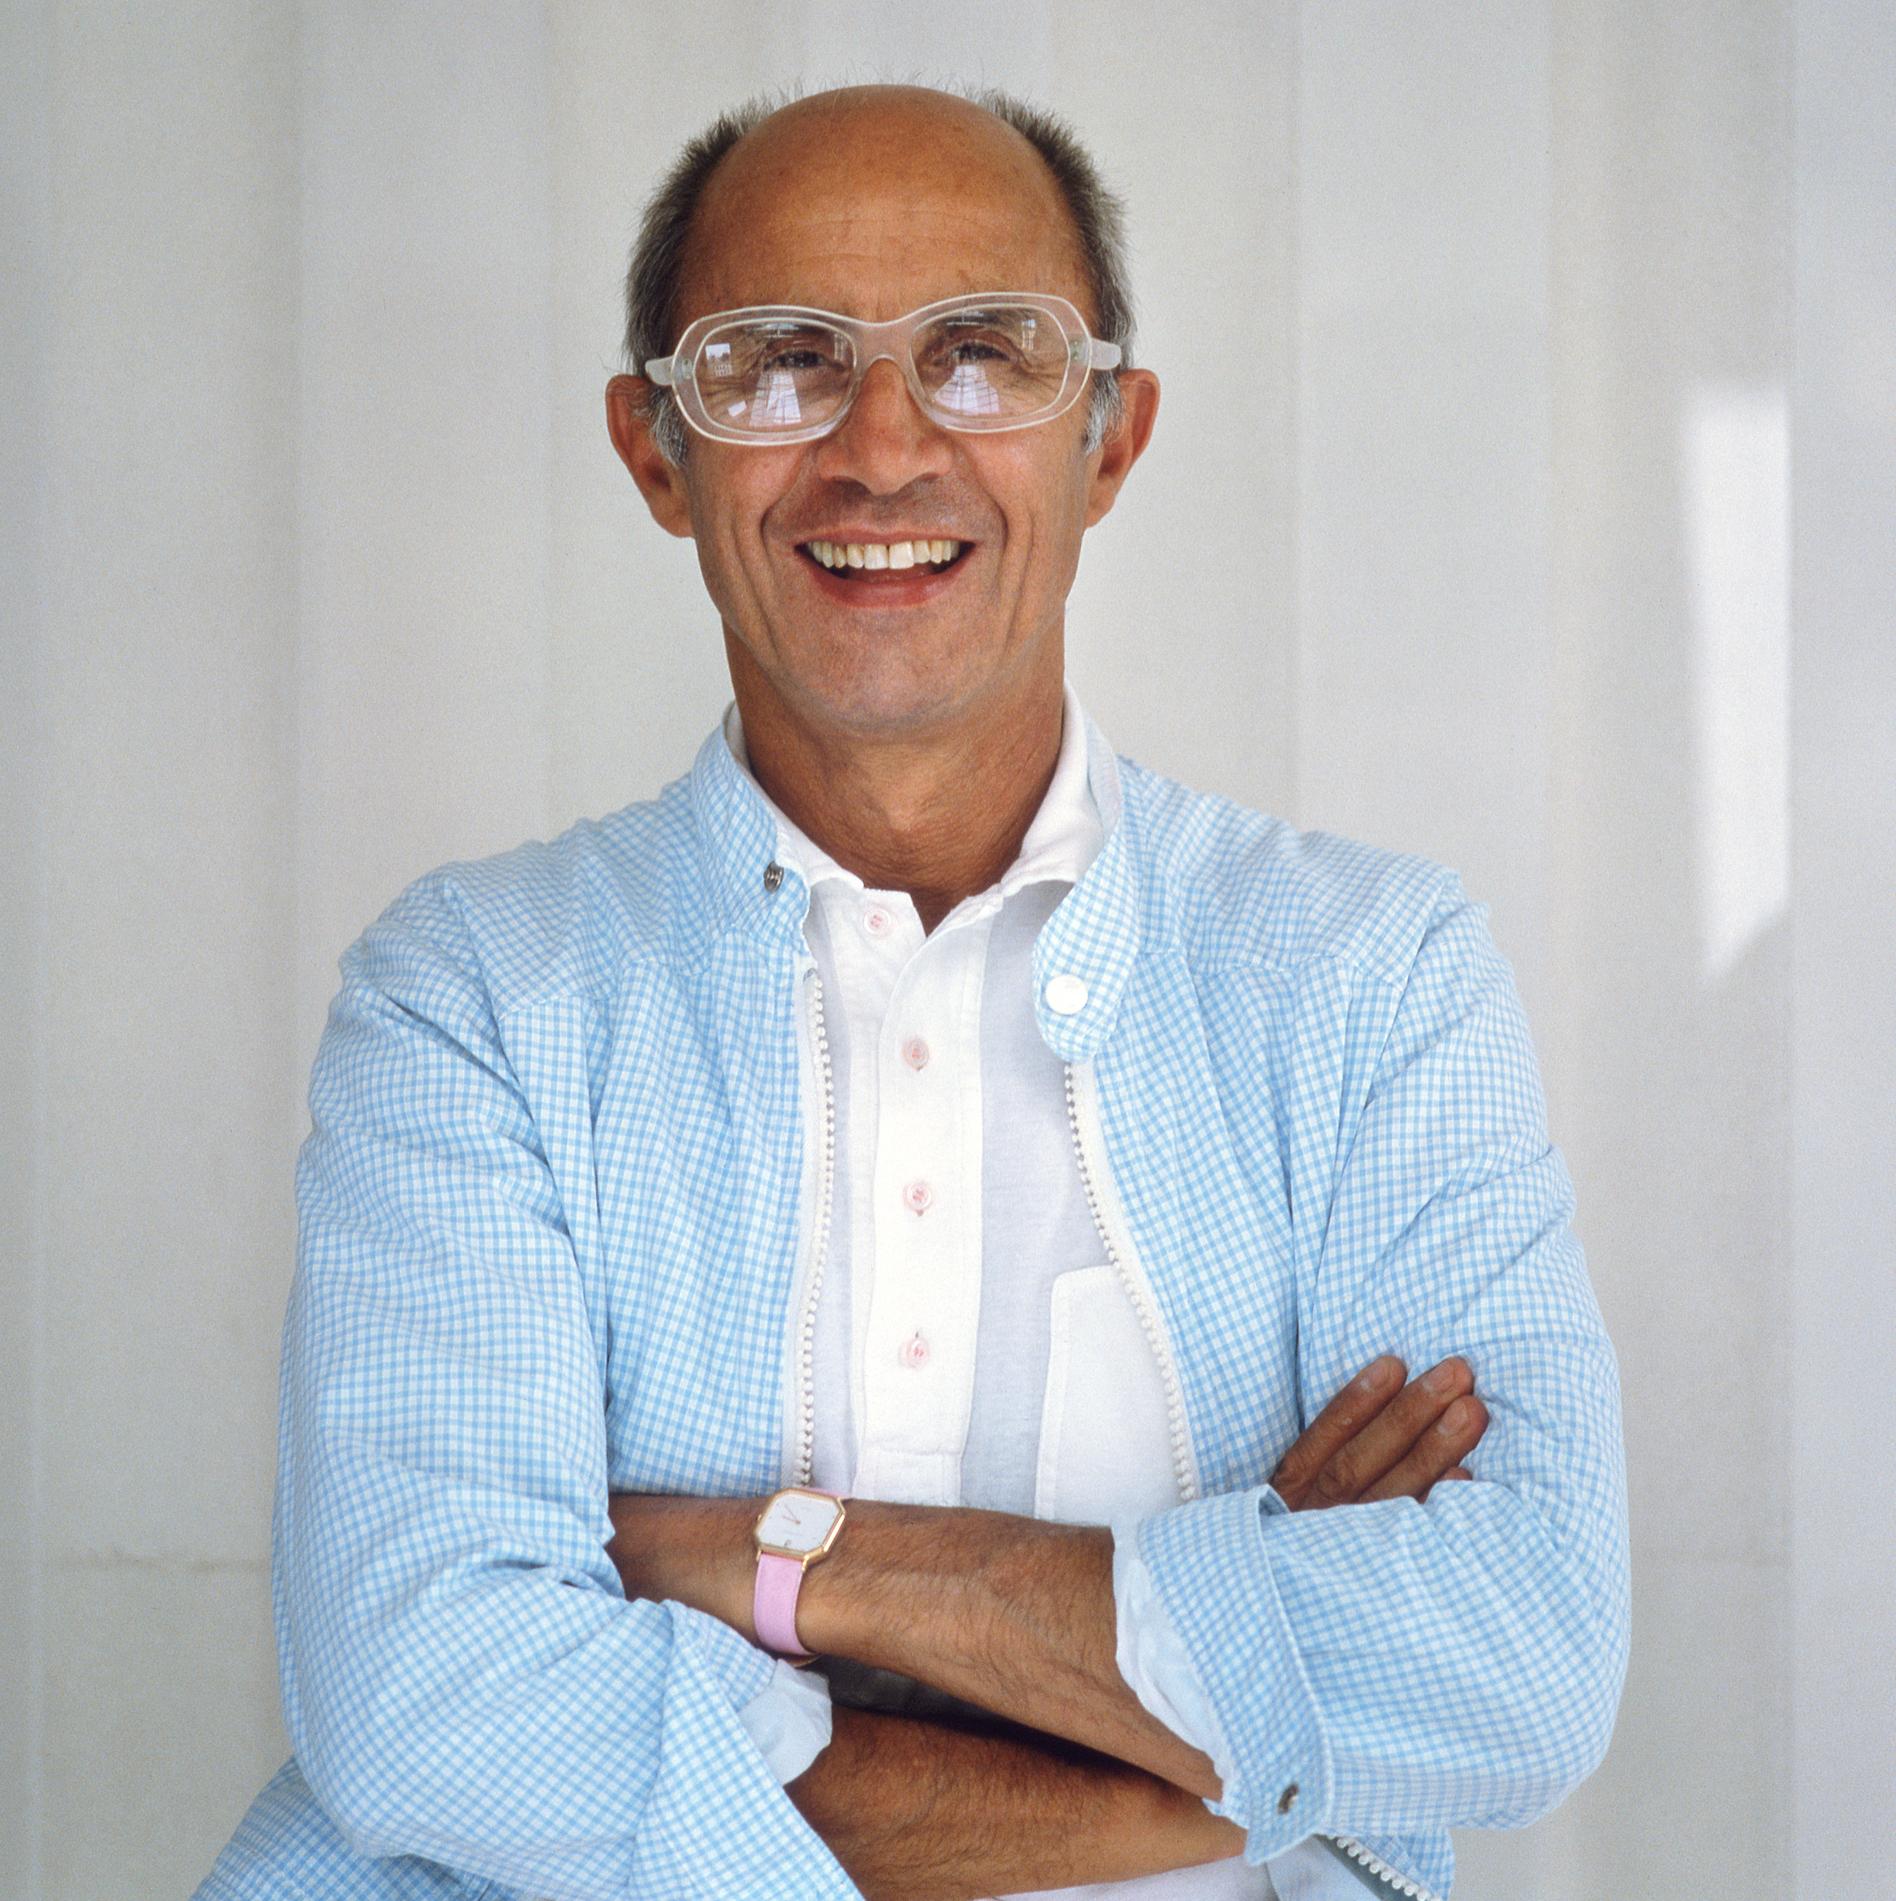 André Courrèges - Wikipedia